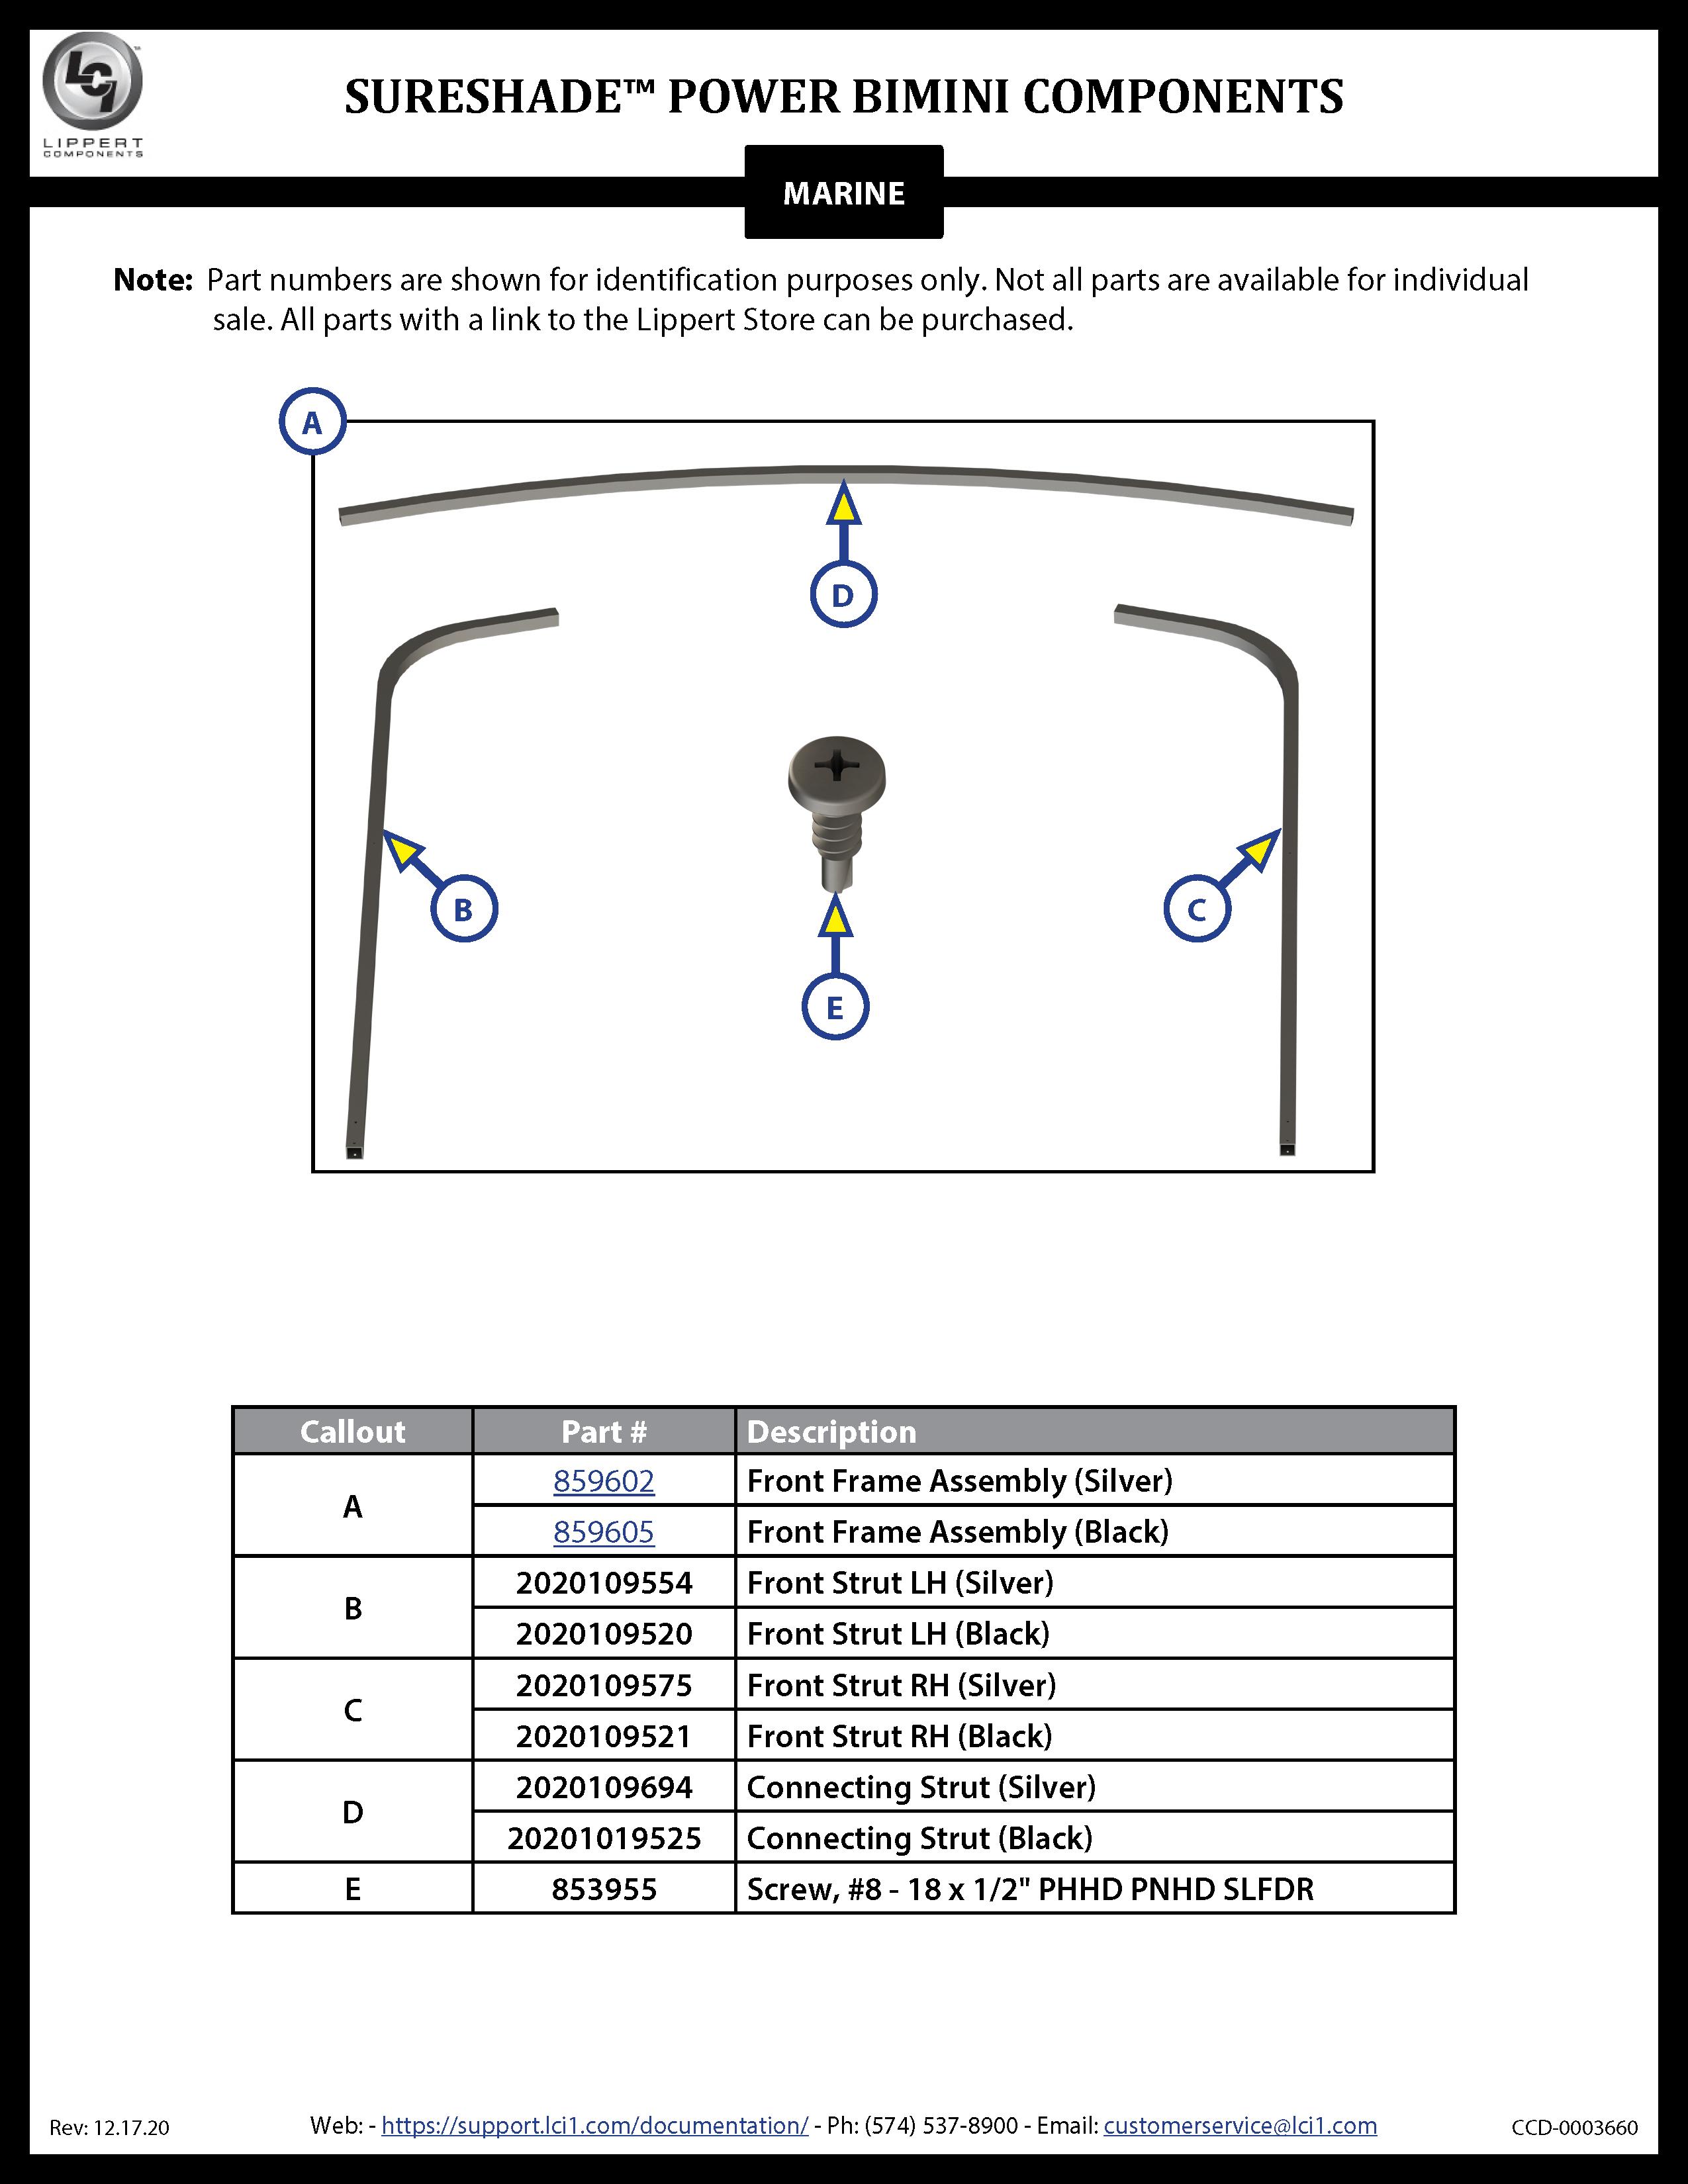 SureShade® Power Bimini Components